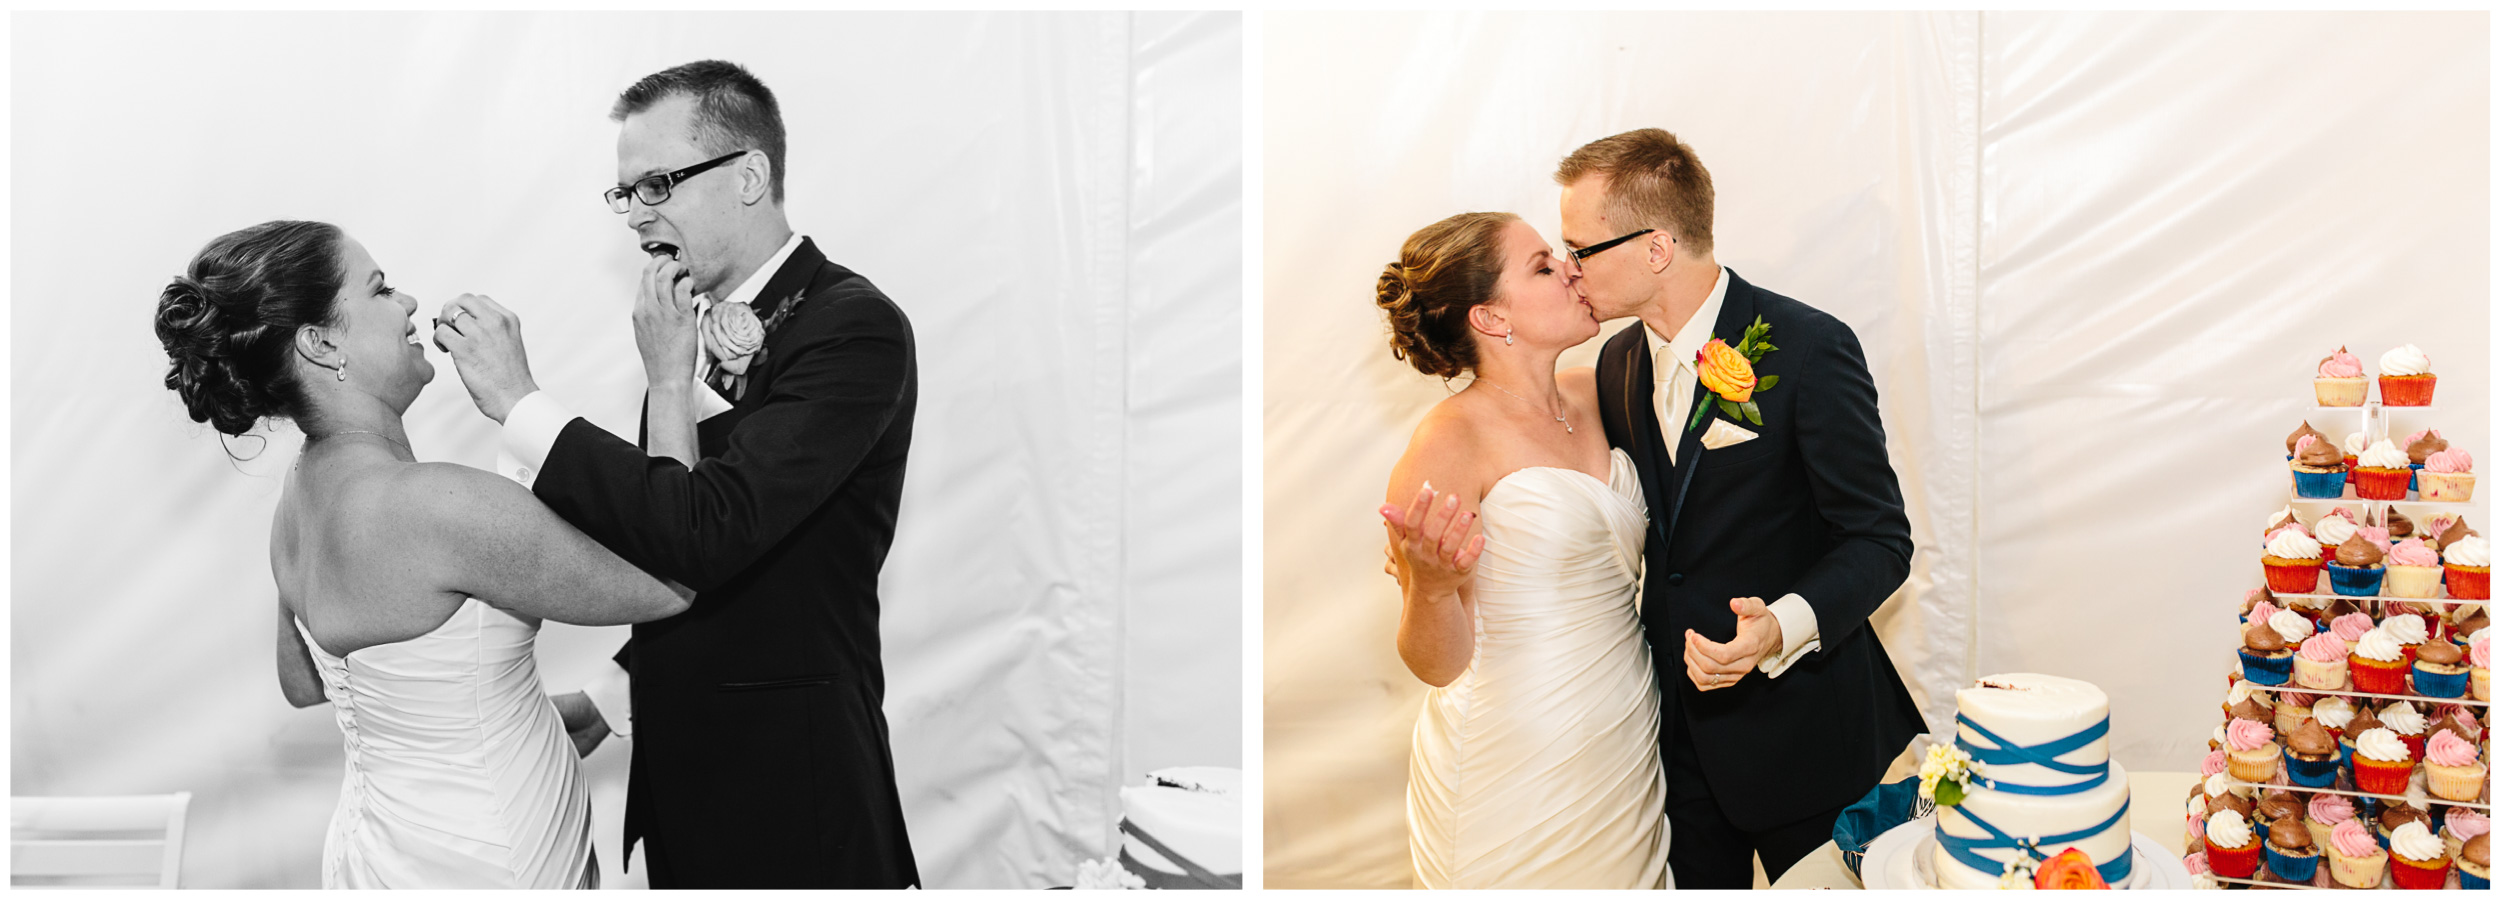 littleton_wedding_63.jpg